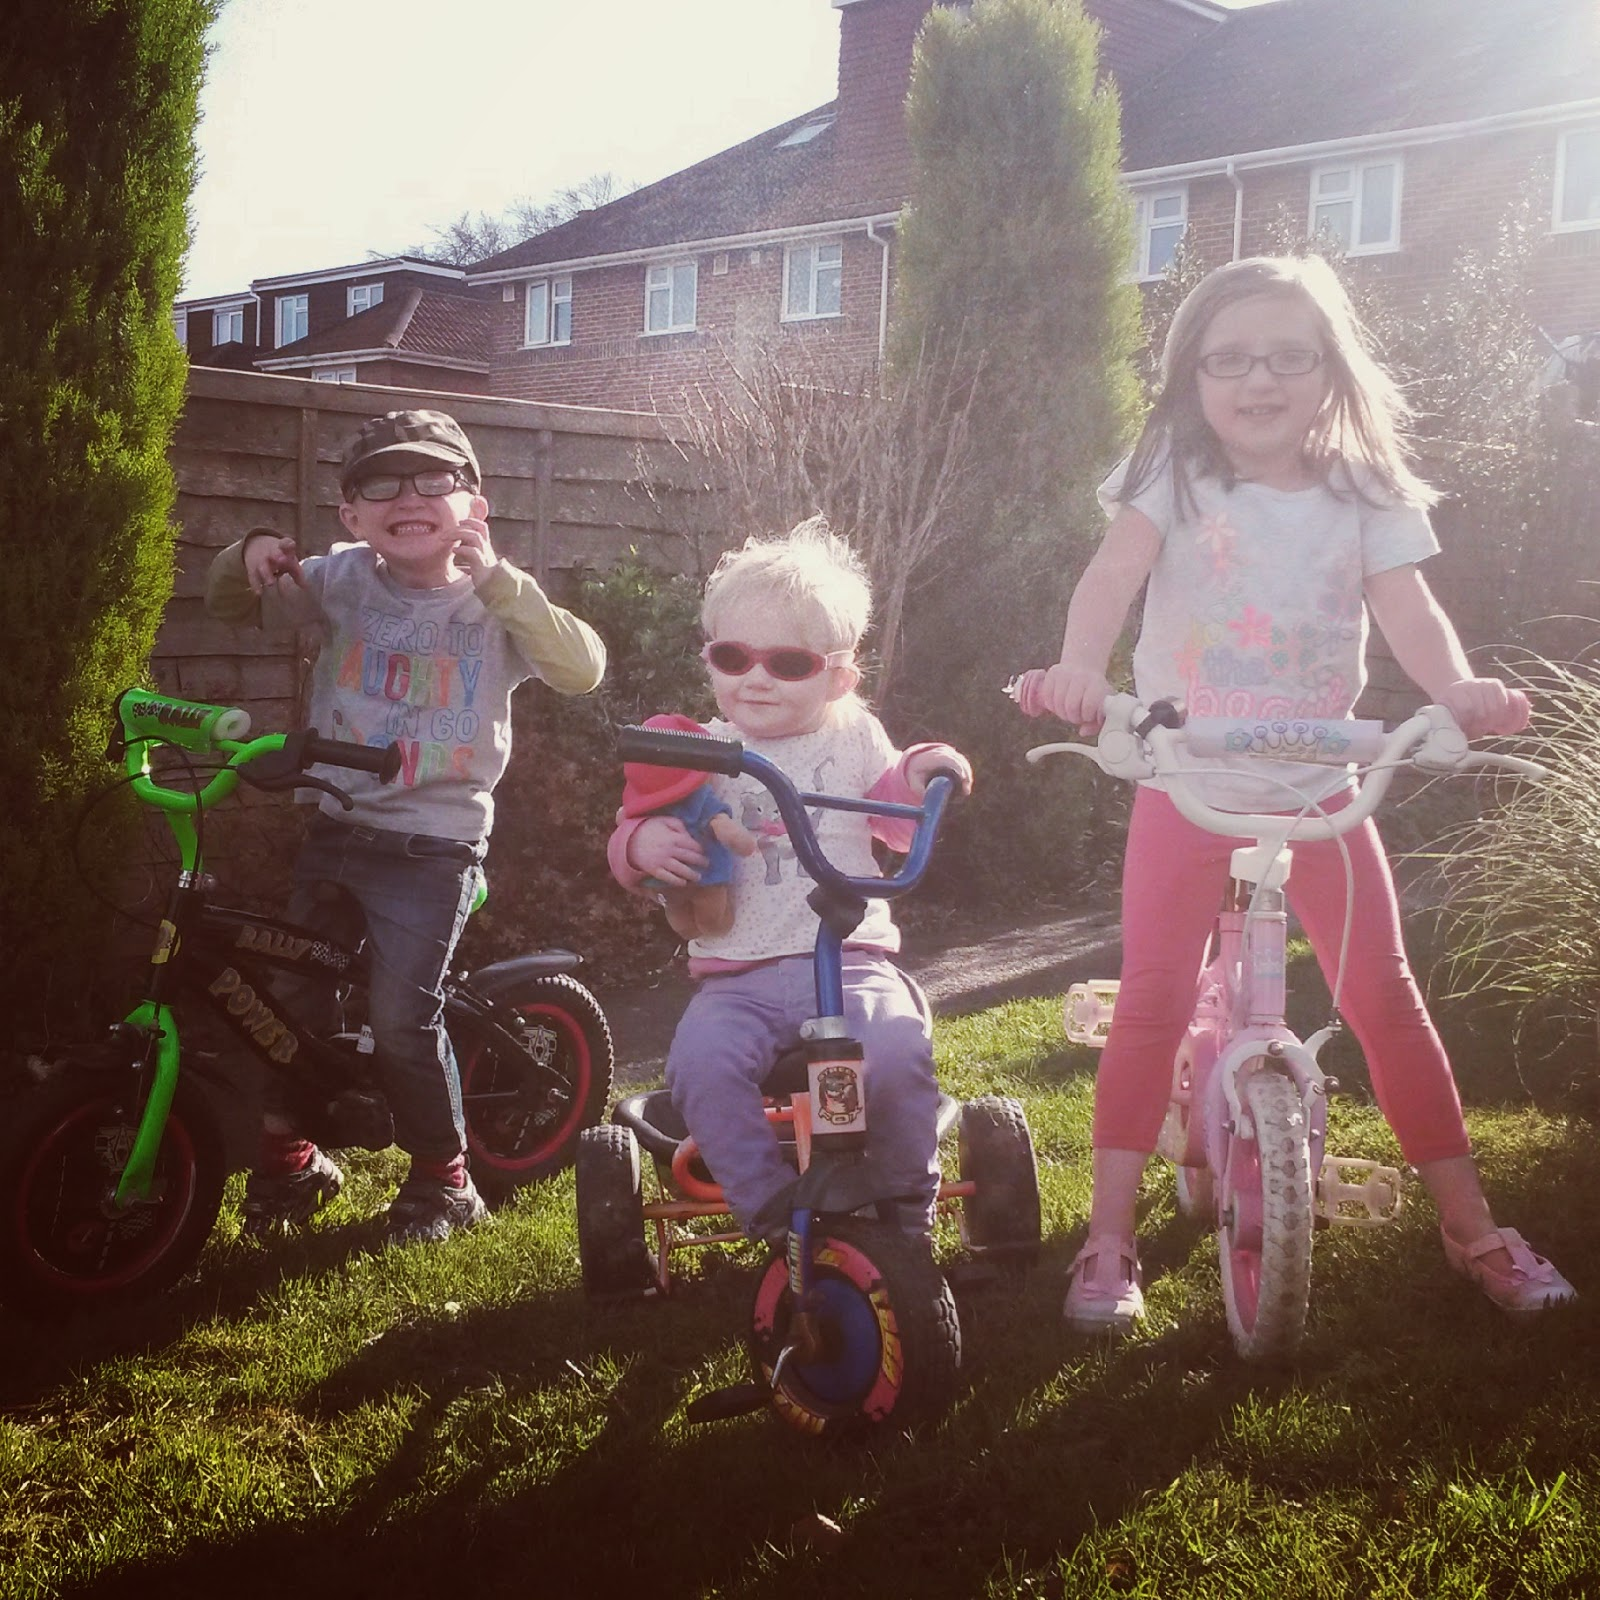 kids on bikes with Paddington